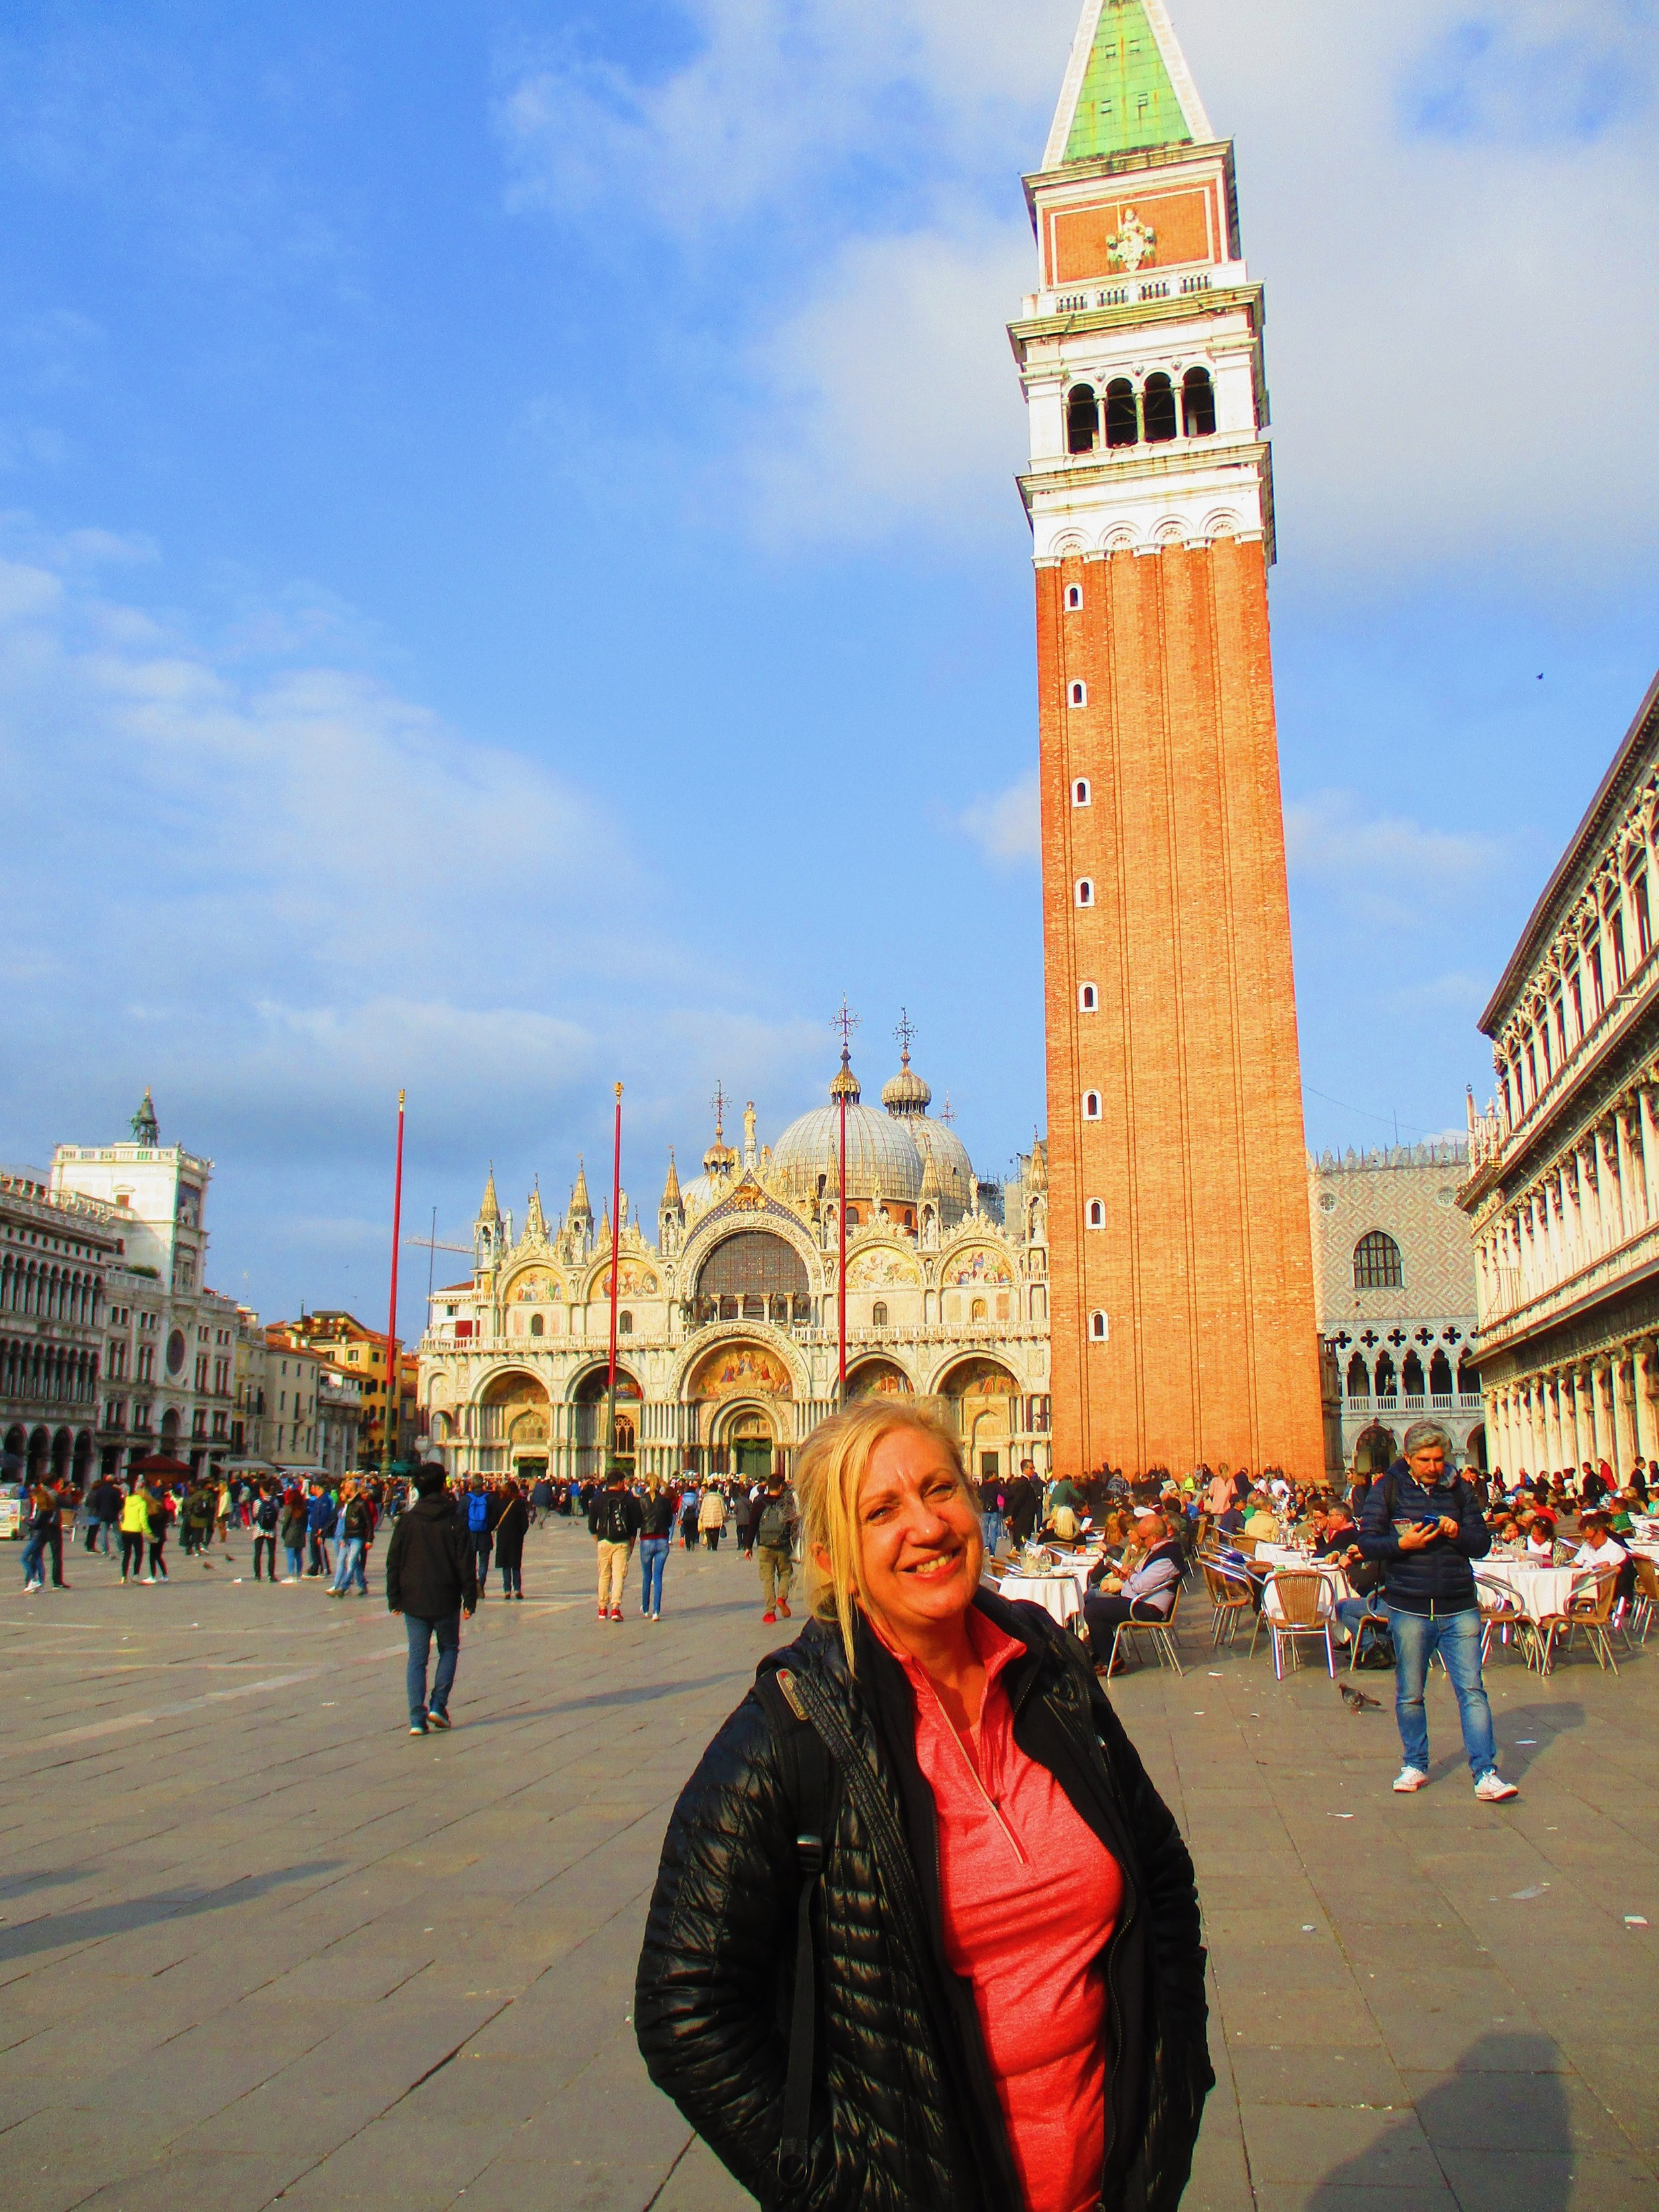 St. Marcos square, Venice